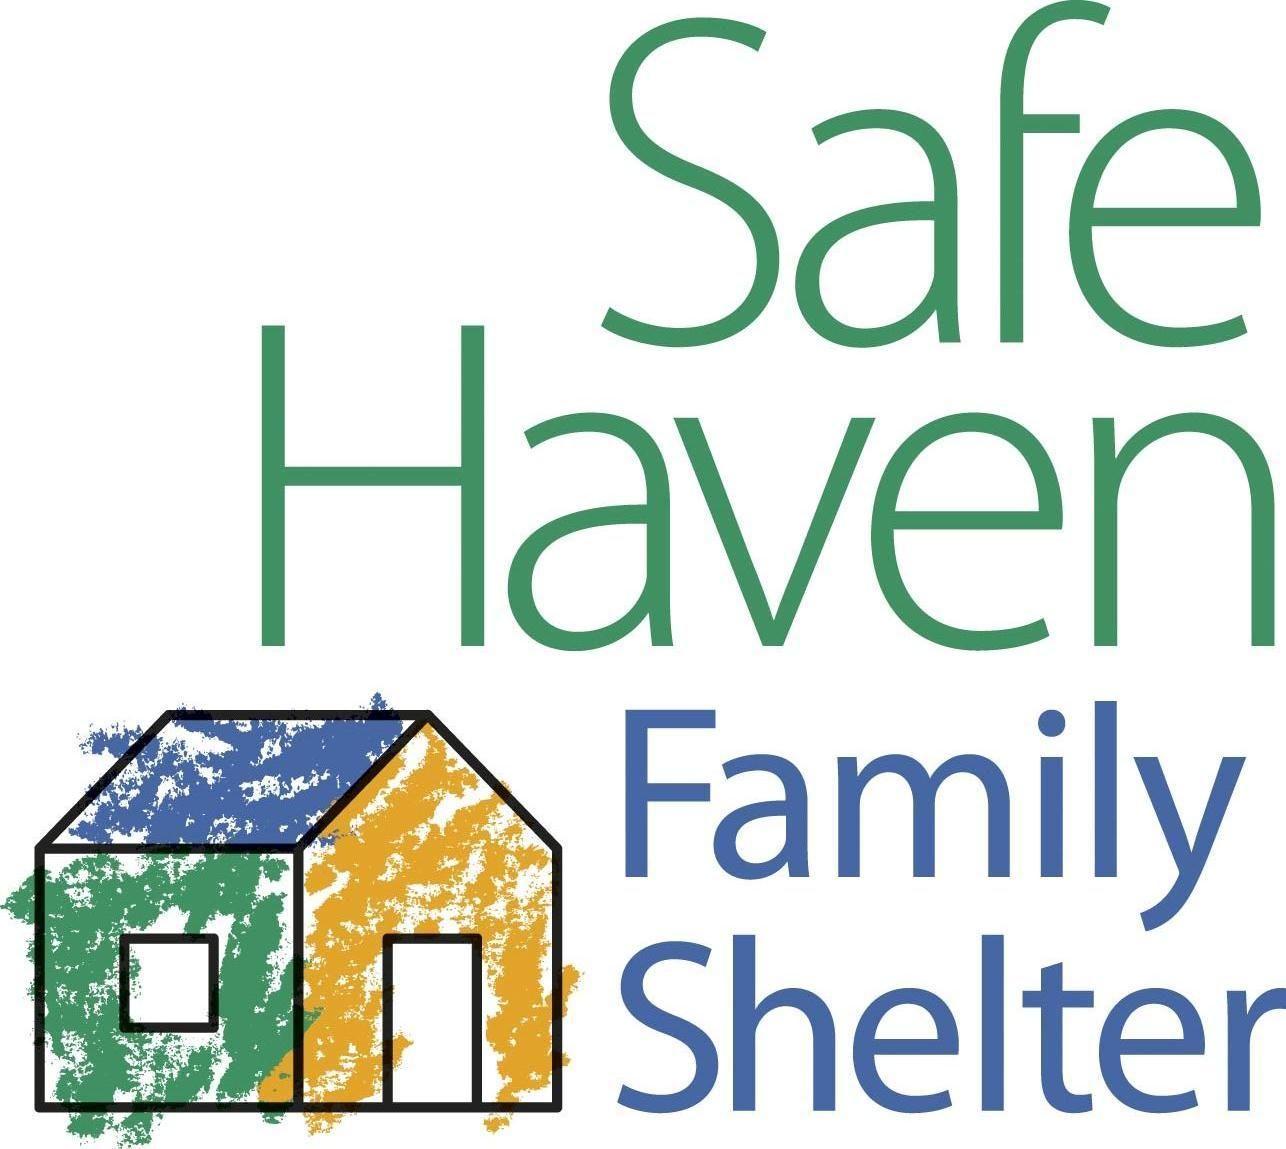 homeless shelter logo Google Search Family shelters